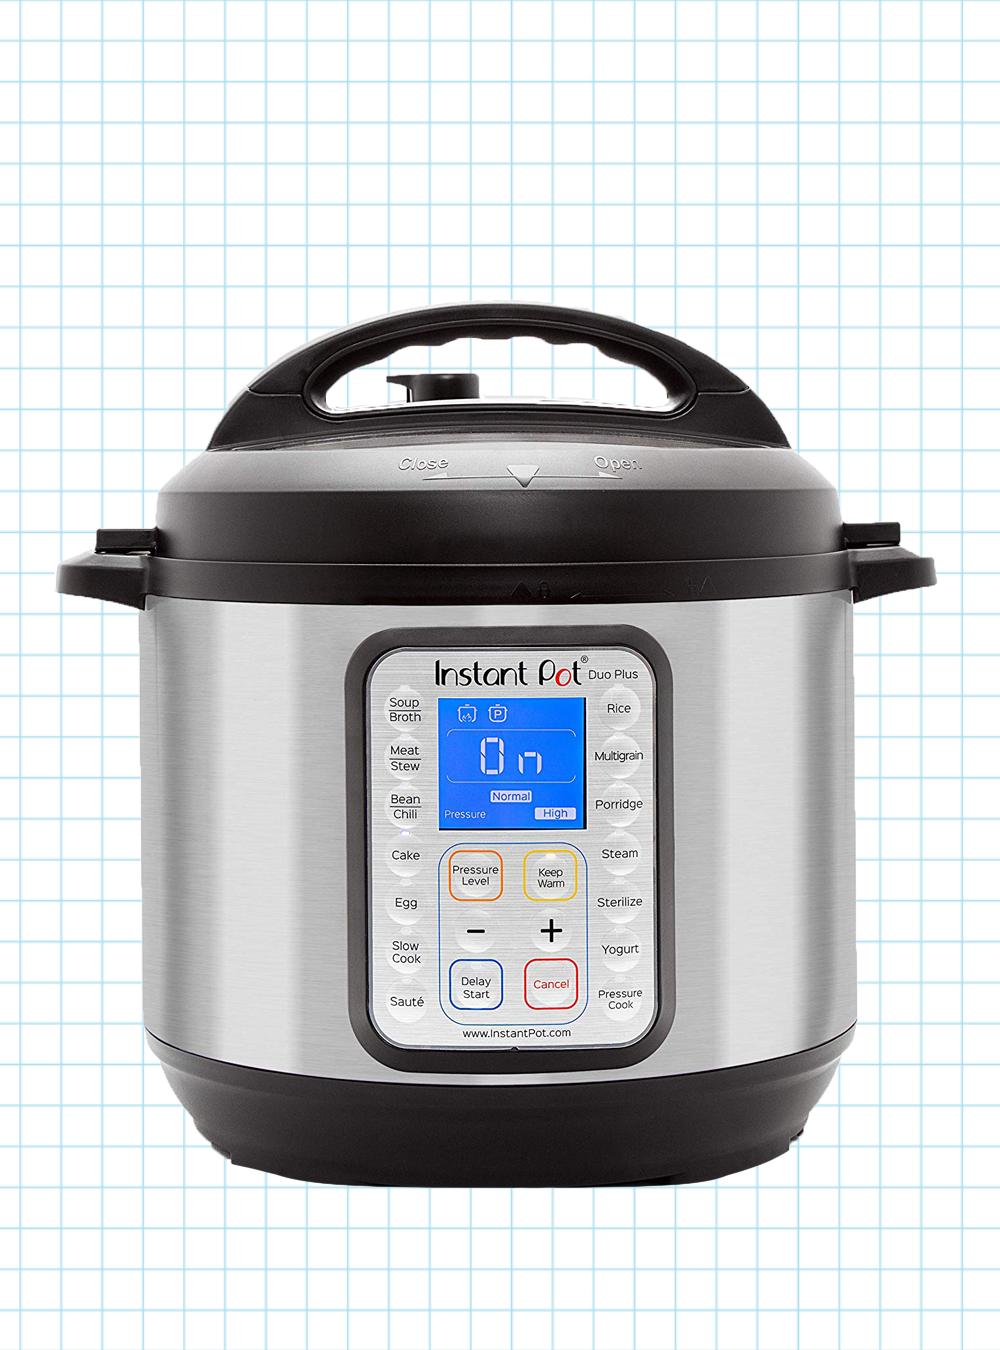 Instant Pot 8-QT Viva 9-in-1 Programmable Pressure Cooker